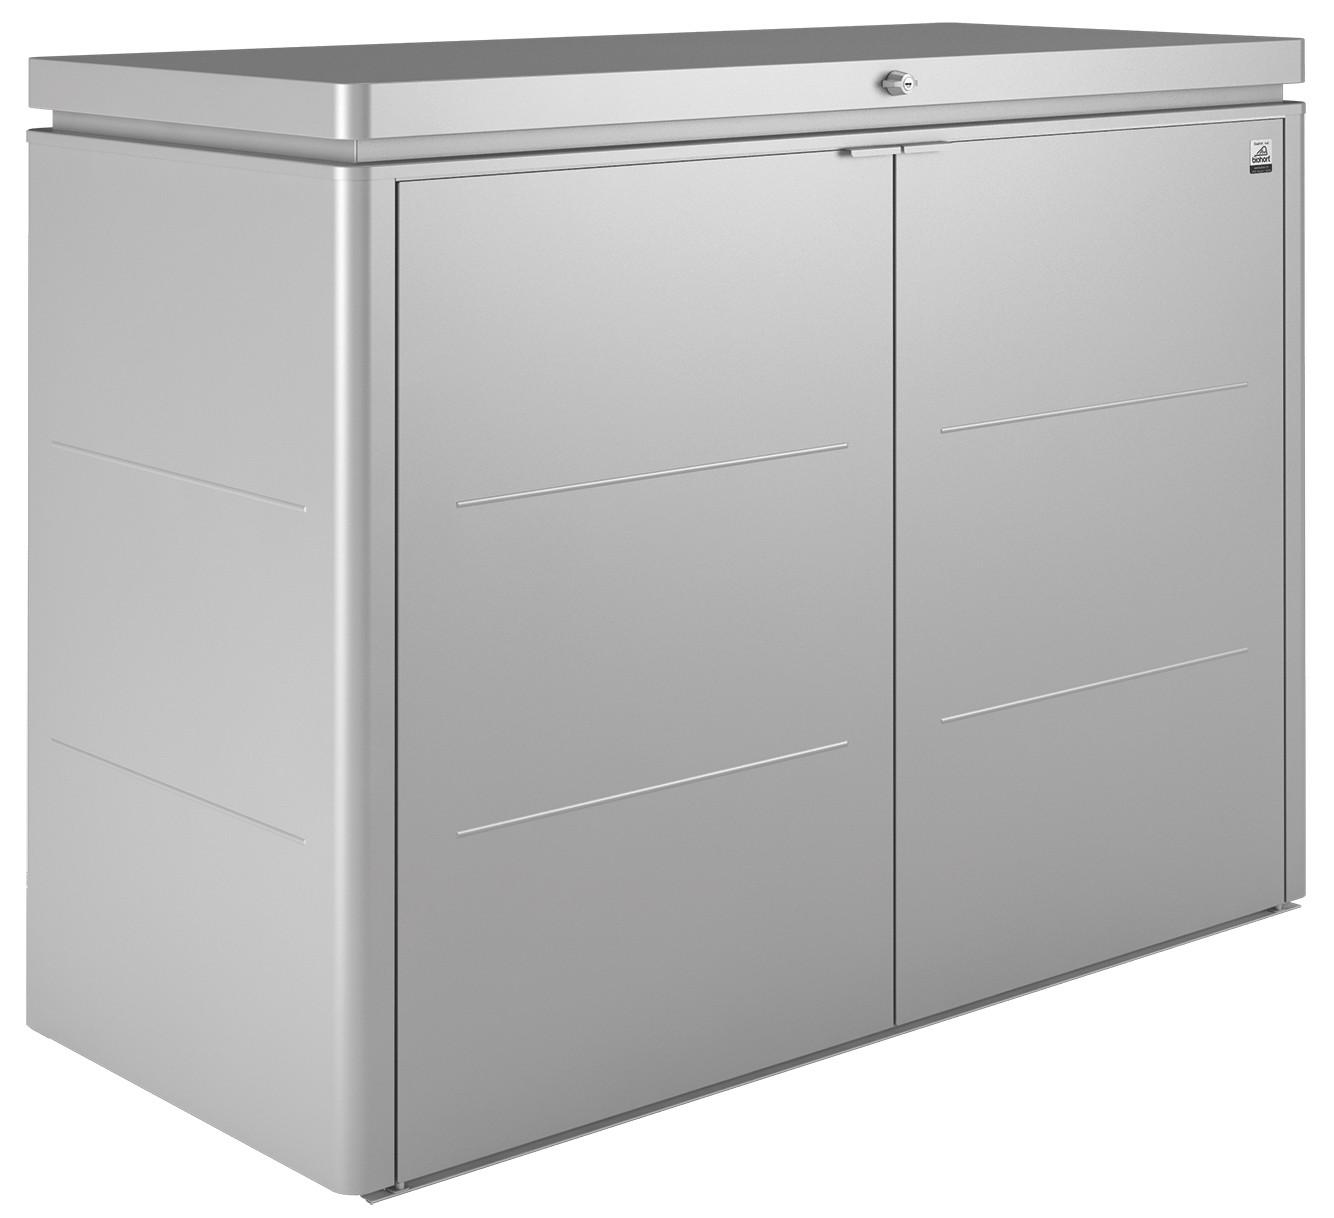 gartenschrank biohort highboard 160 silber metallic. Black Bedroom Furniture Sets. Home Design Ideas